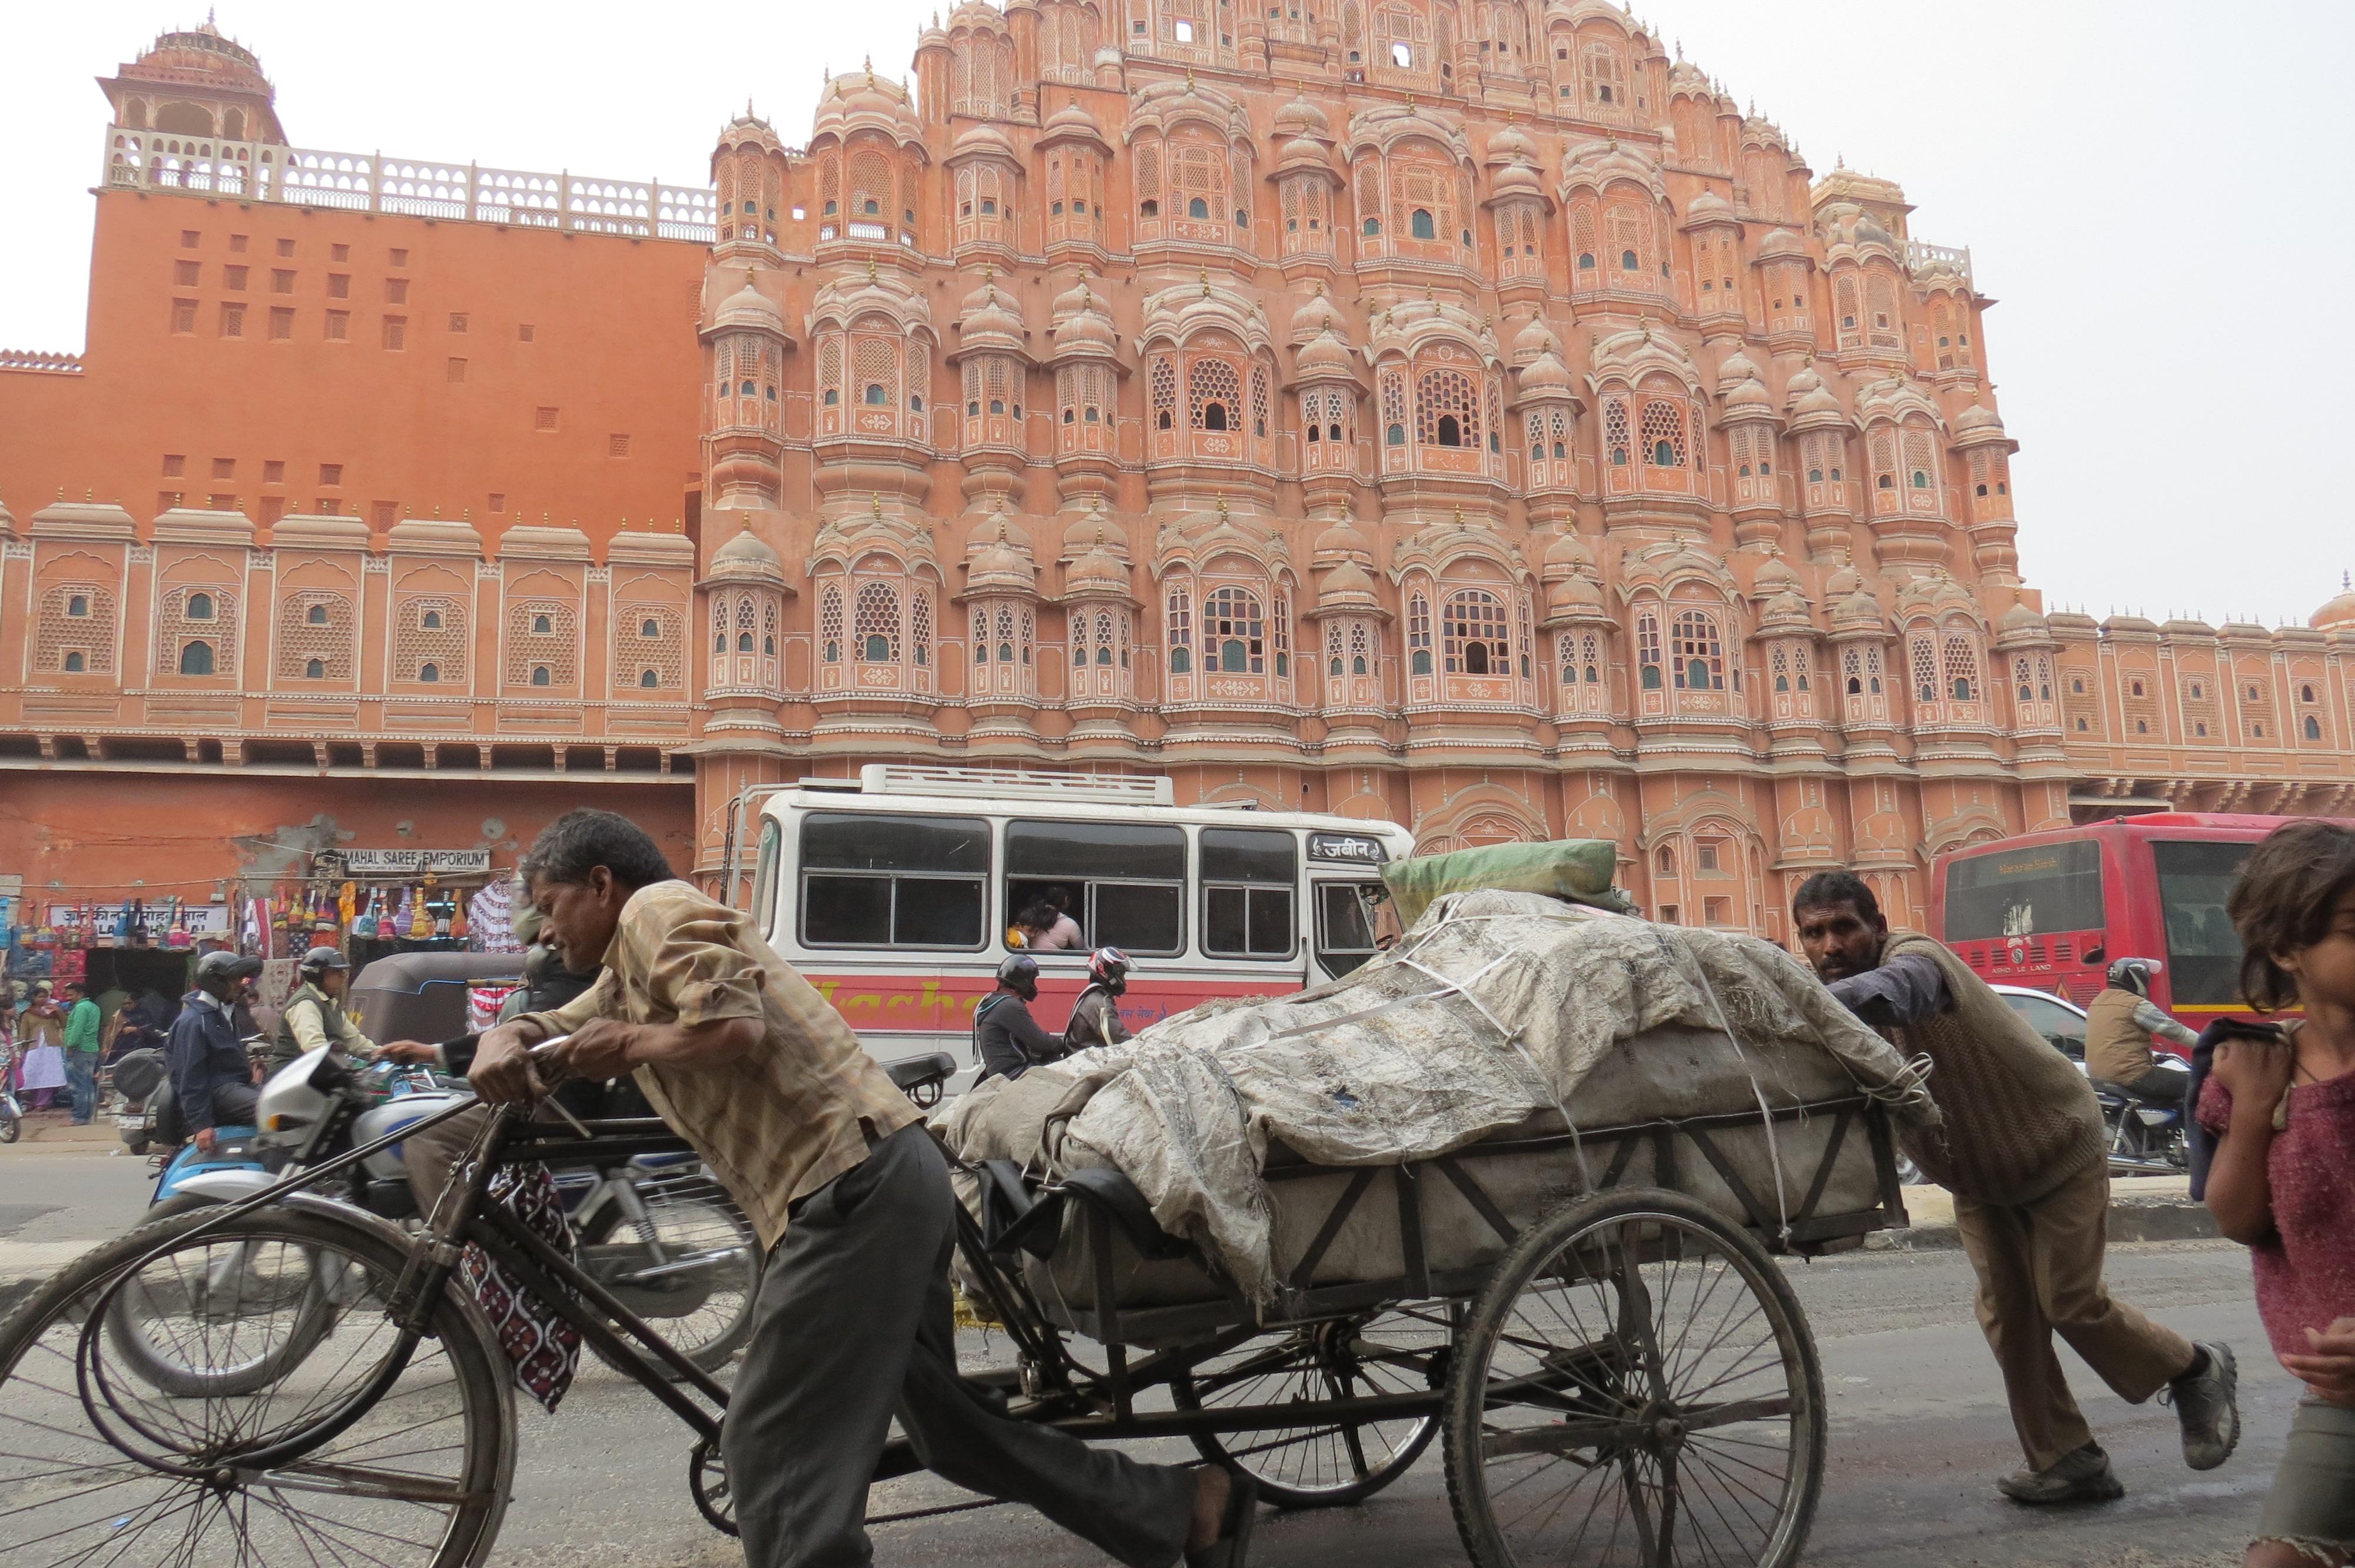 Luca Errera, Daniela Trastulli, India, Rajasthan, Jaipur, palazzo dei venti, carretto